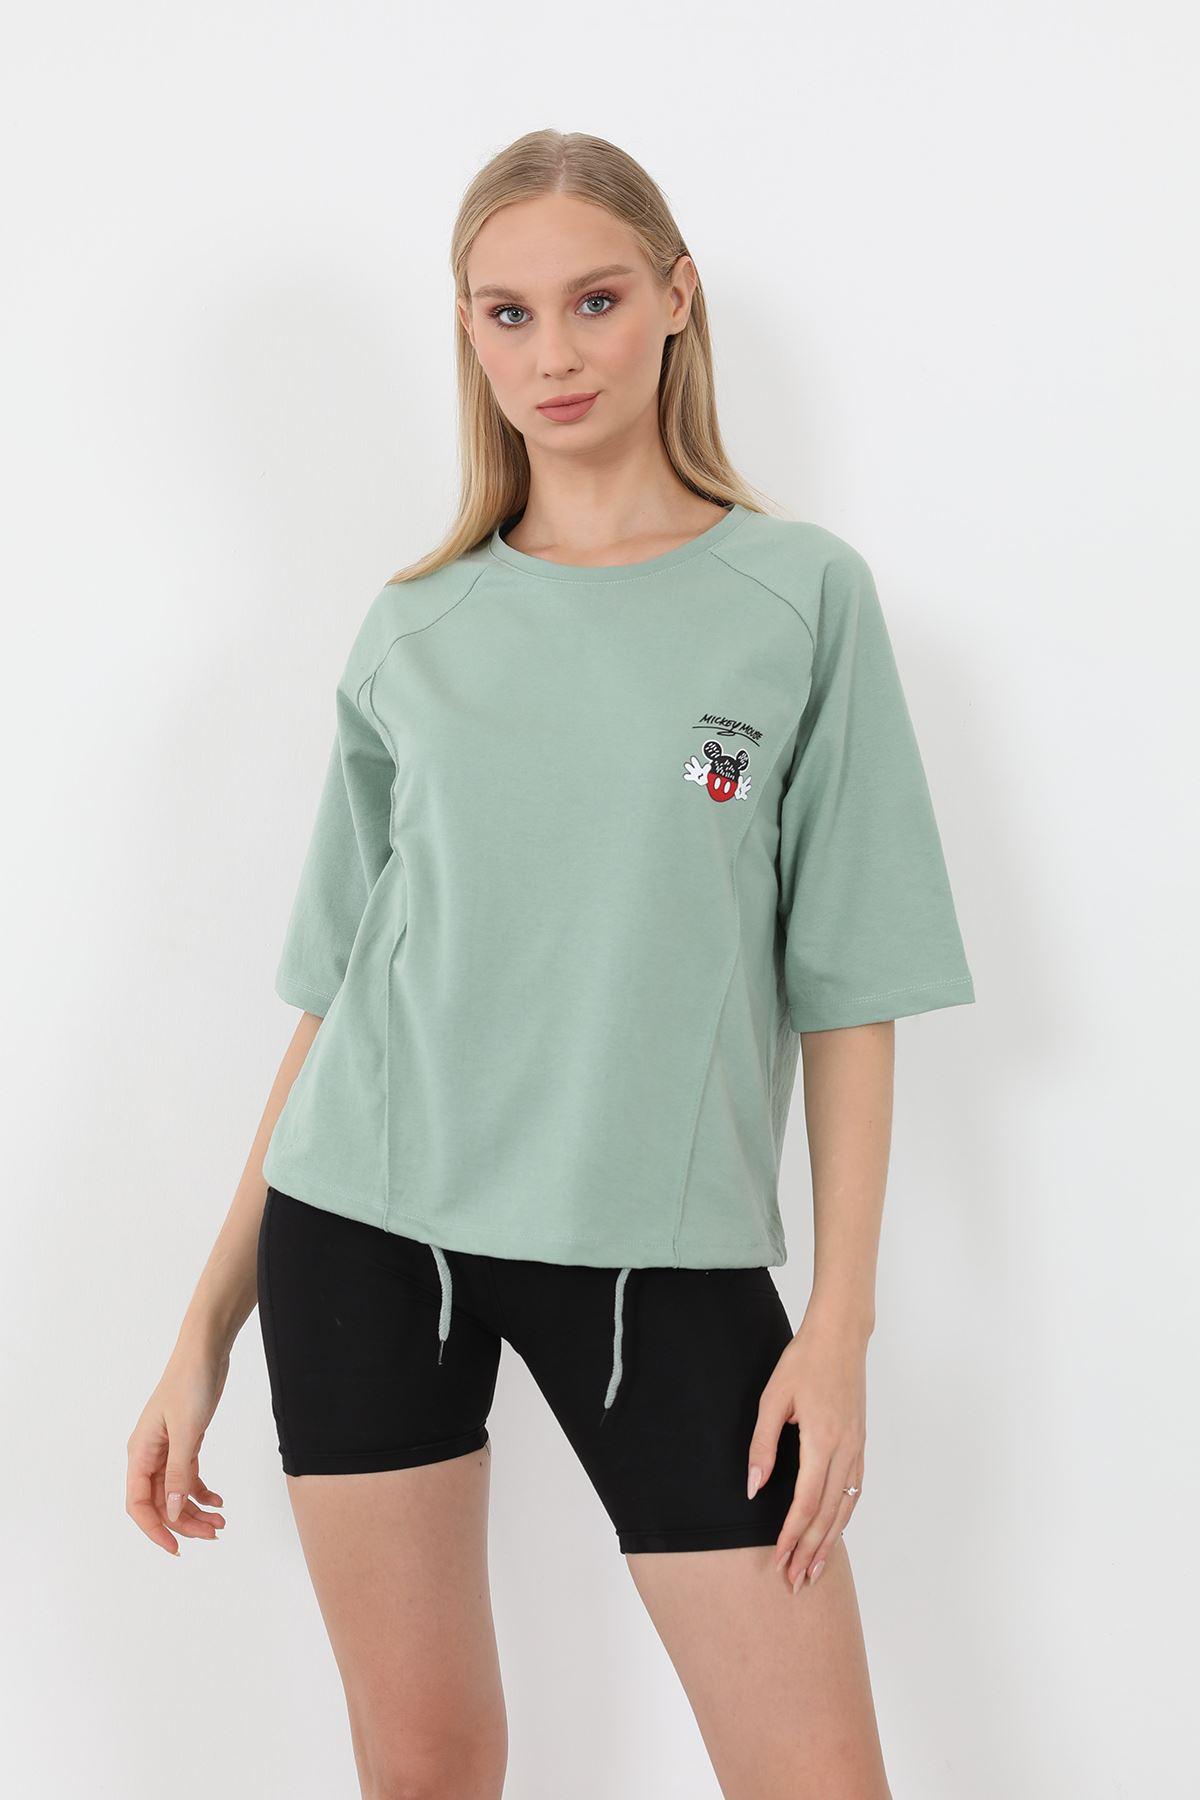 Mickey Mouse Baskılı Sweatshirt-Mint